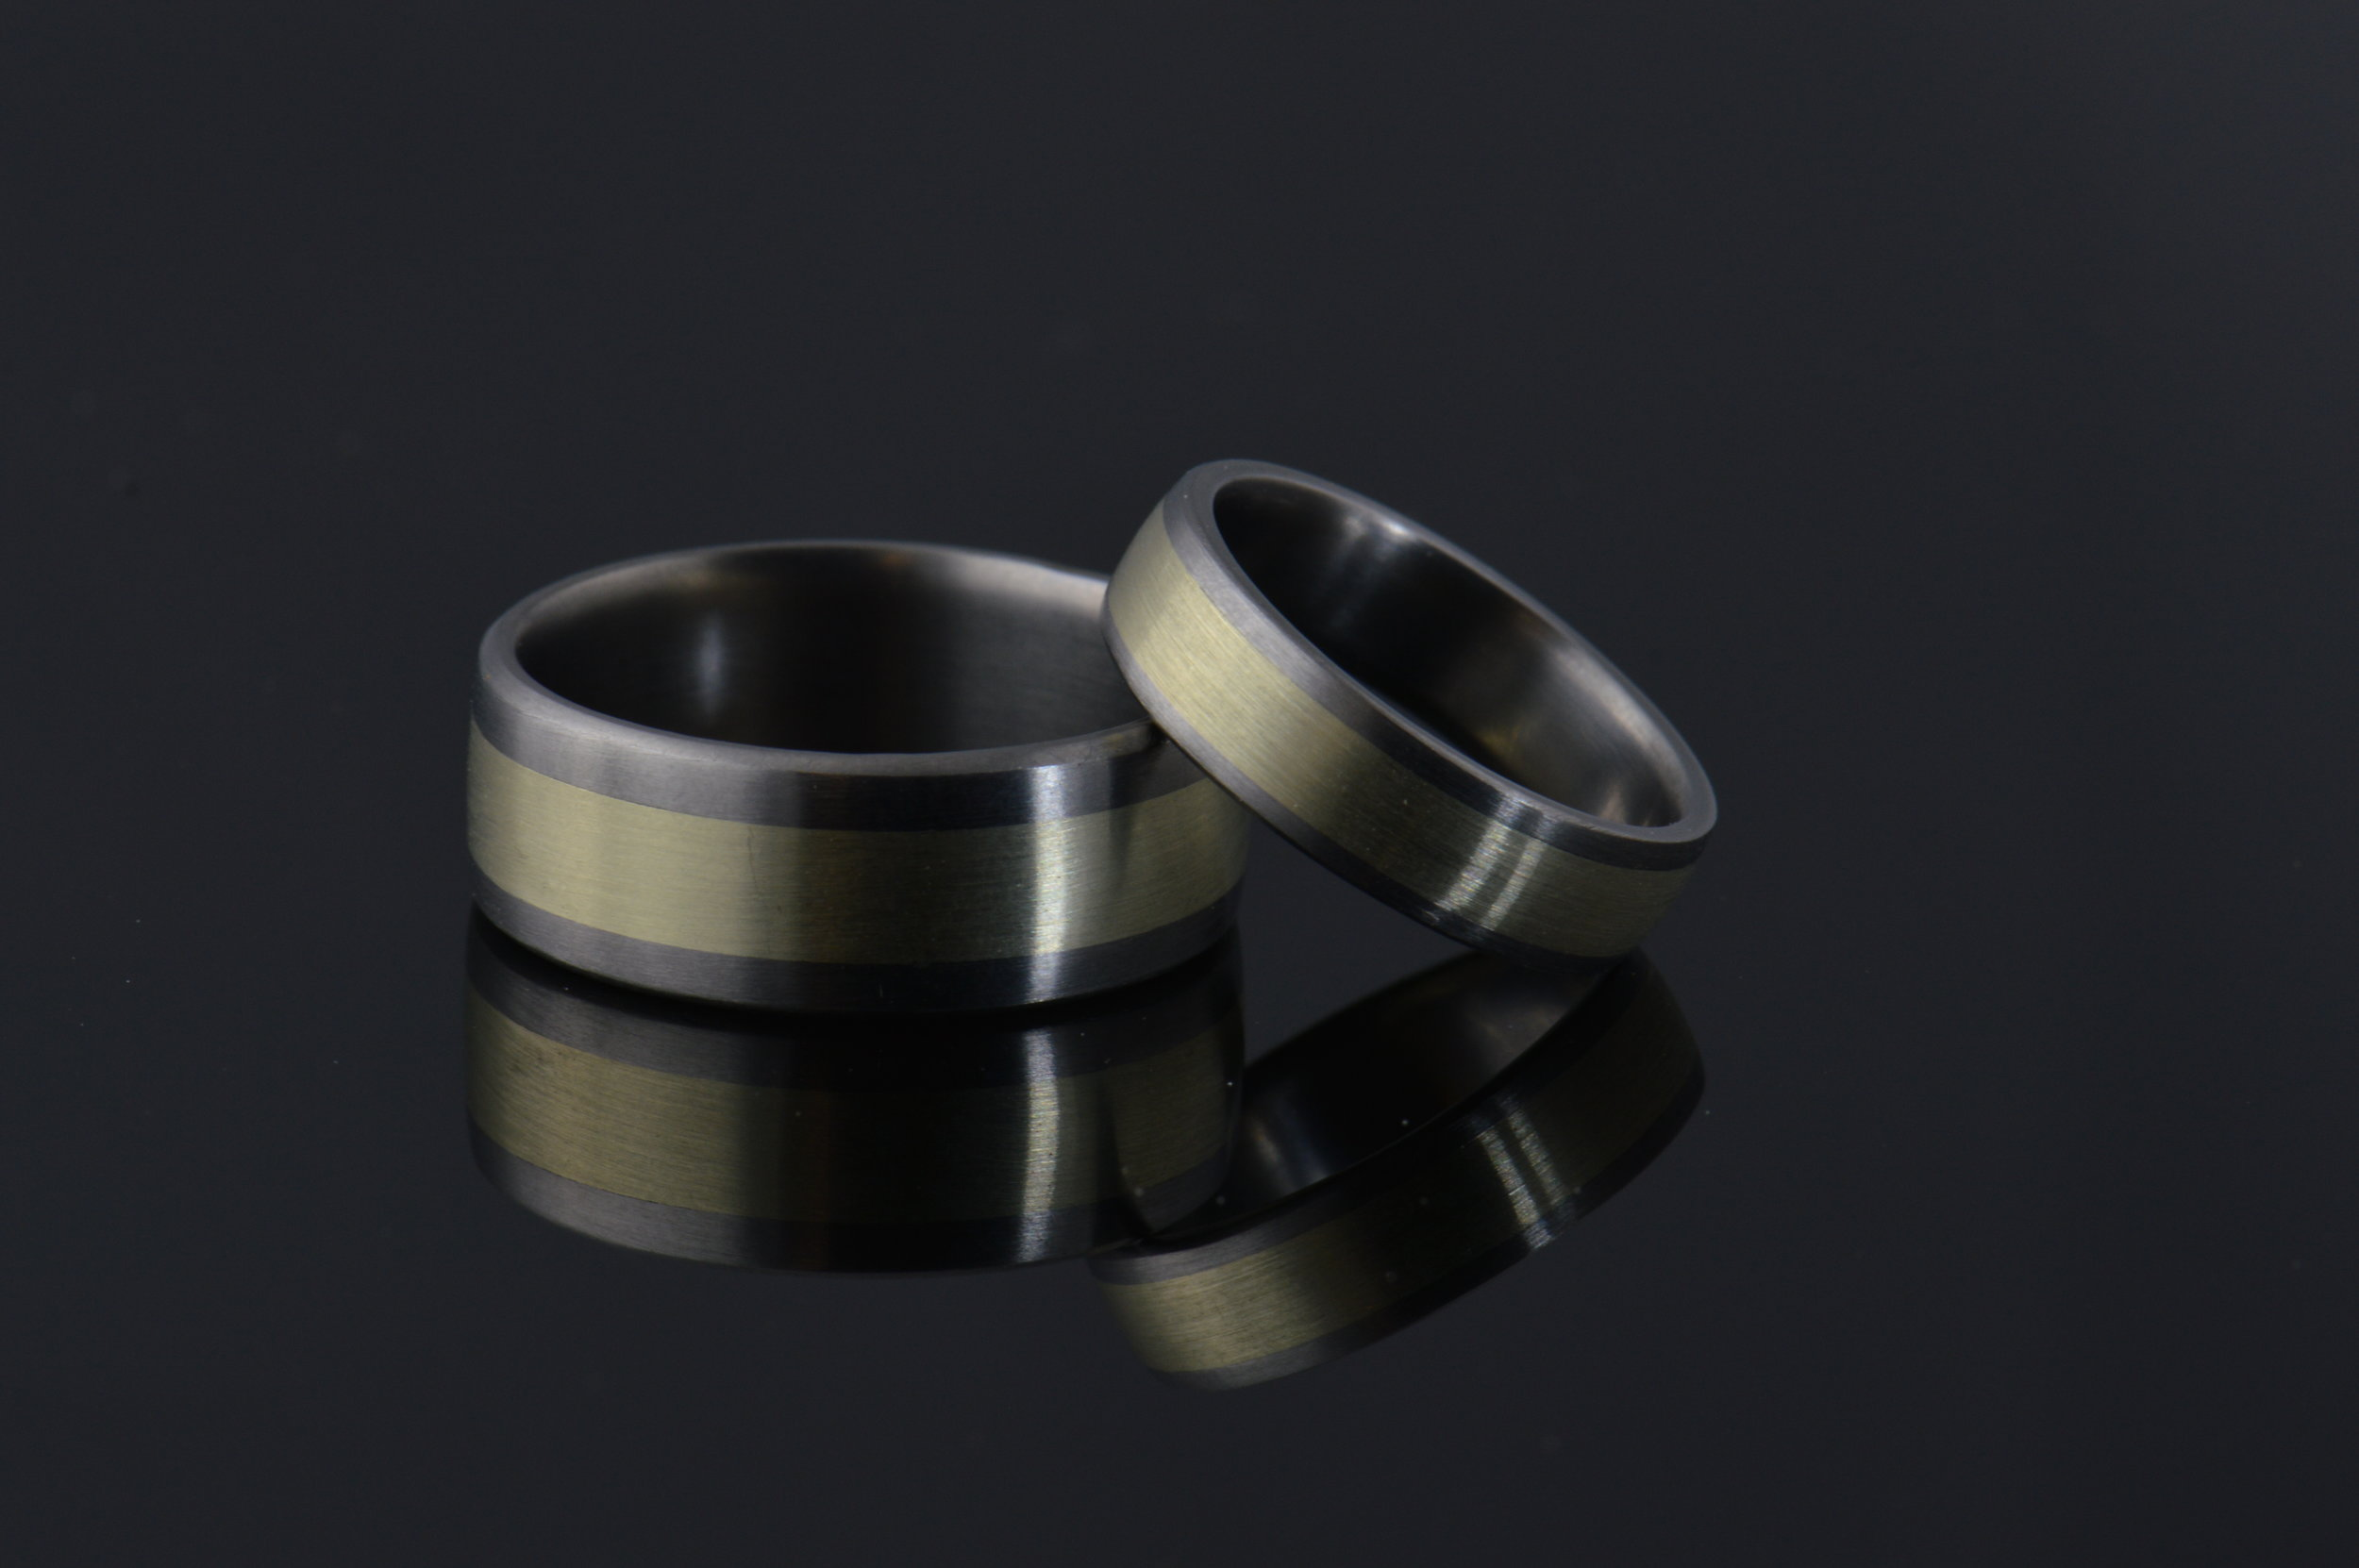 darvier-14k-green-gold-inlay-titanium-ring.JPG